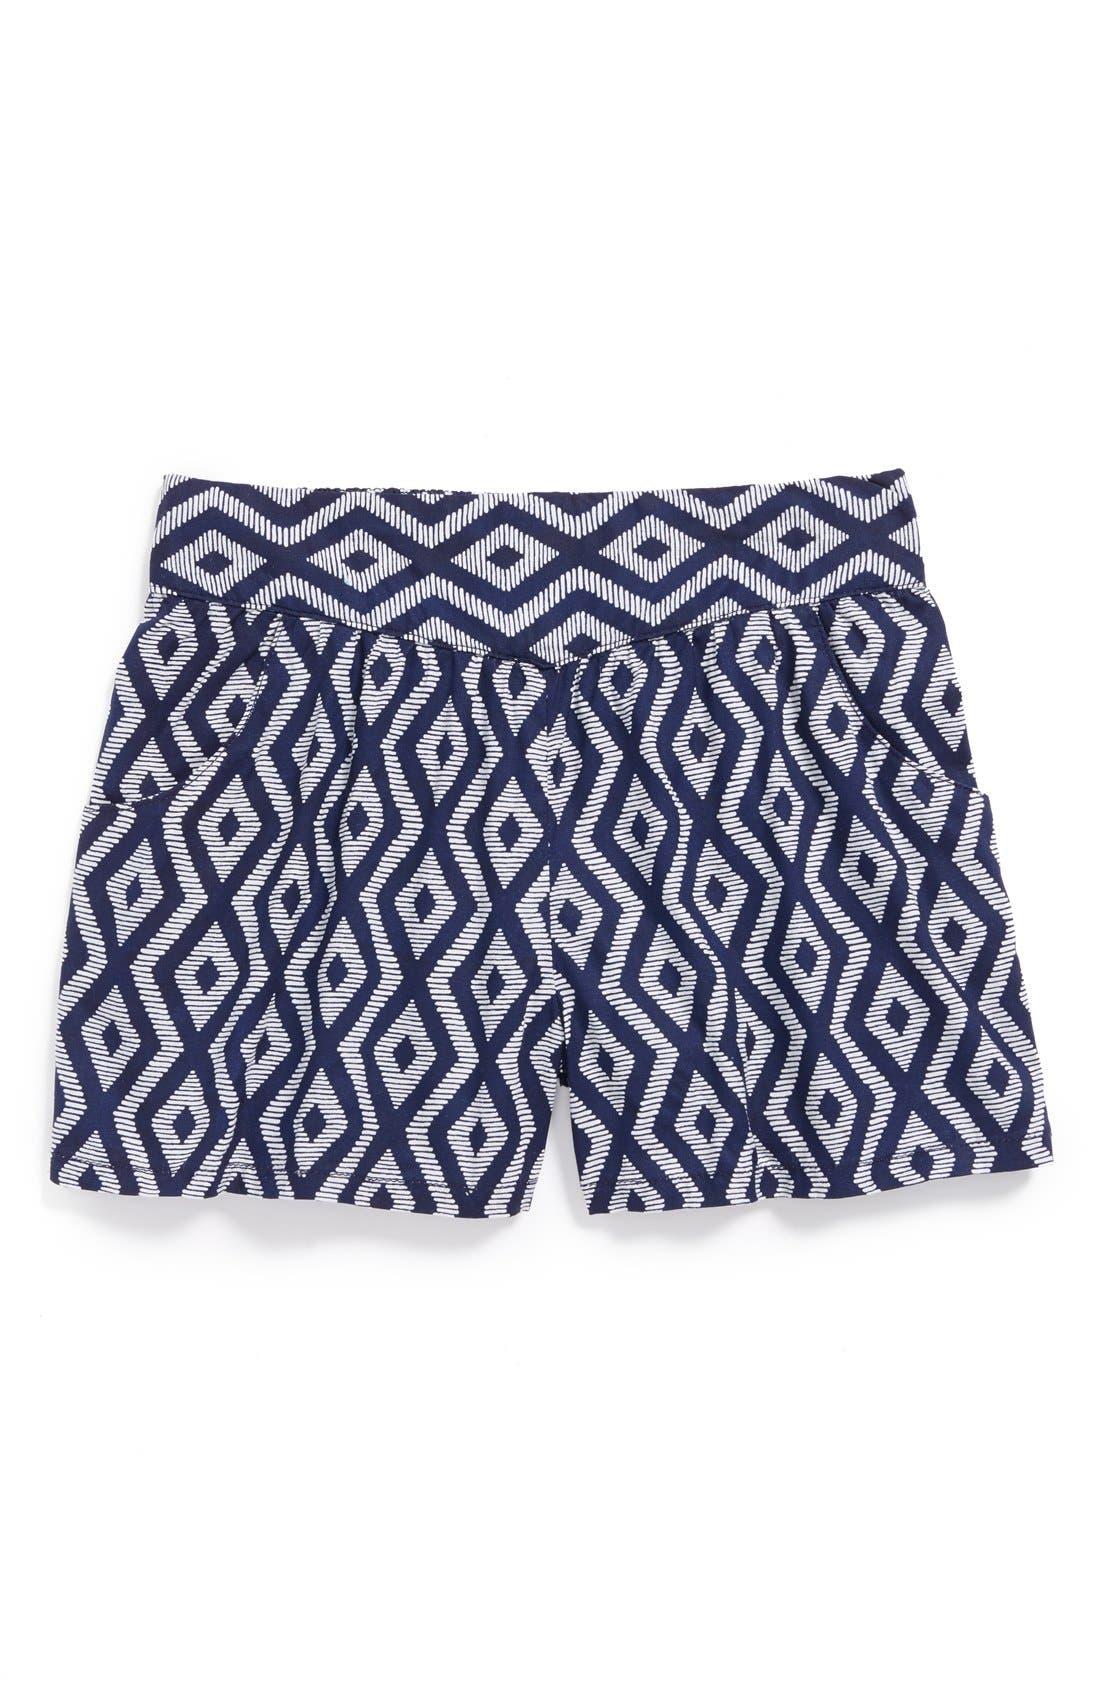 Alternate Image 1 Selected - Tucker + Tate 'Deidre' Shorts (Big Girls)